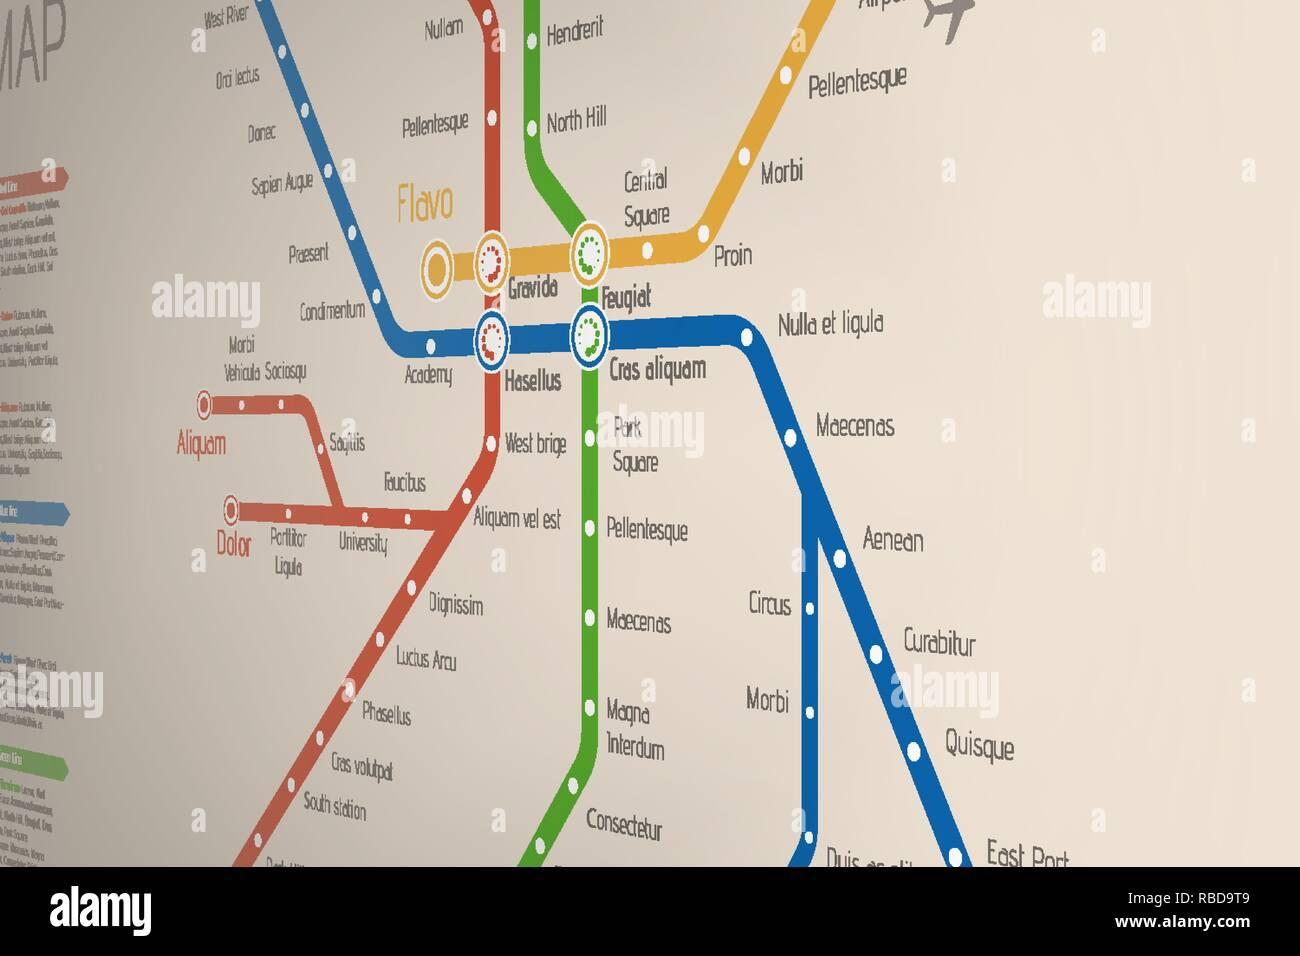 Subway Map Design.Abstract Metro Or Subway Map Design Template Stock Vector Art